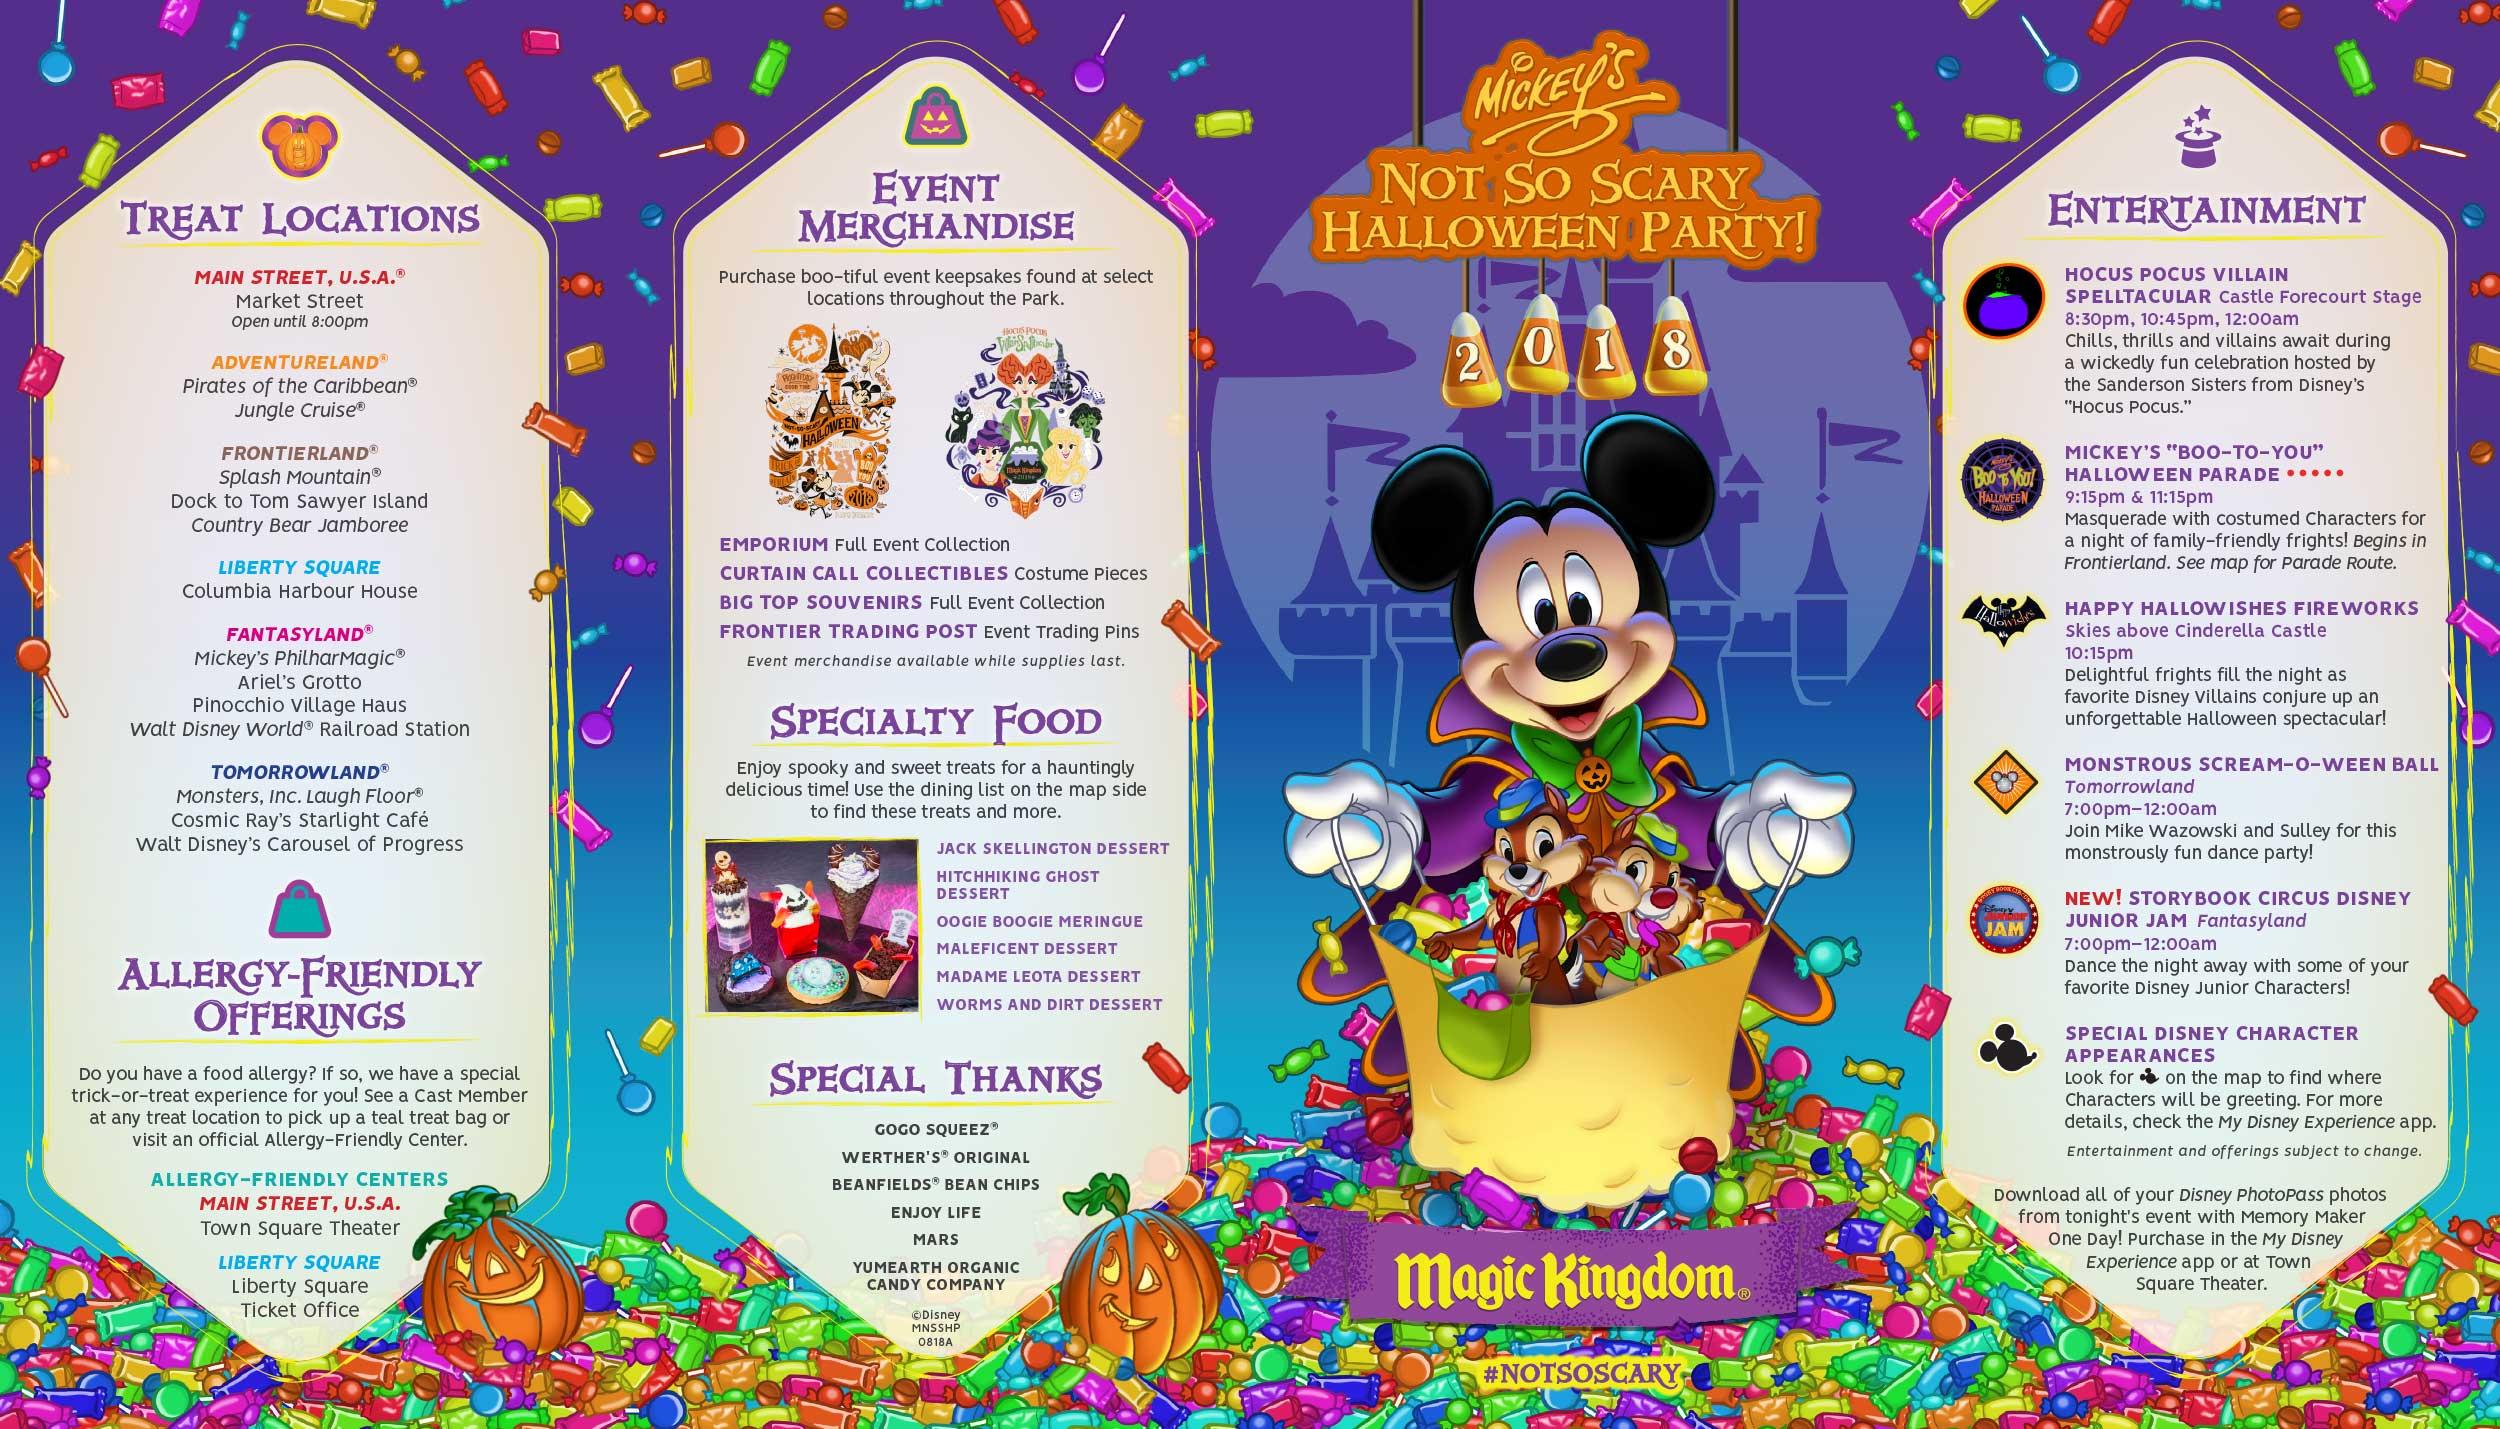 mickeys-not-so-scary-halloween-party-map1.jpg